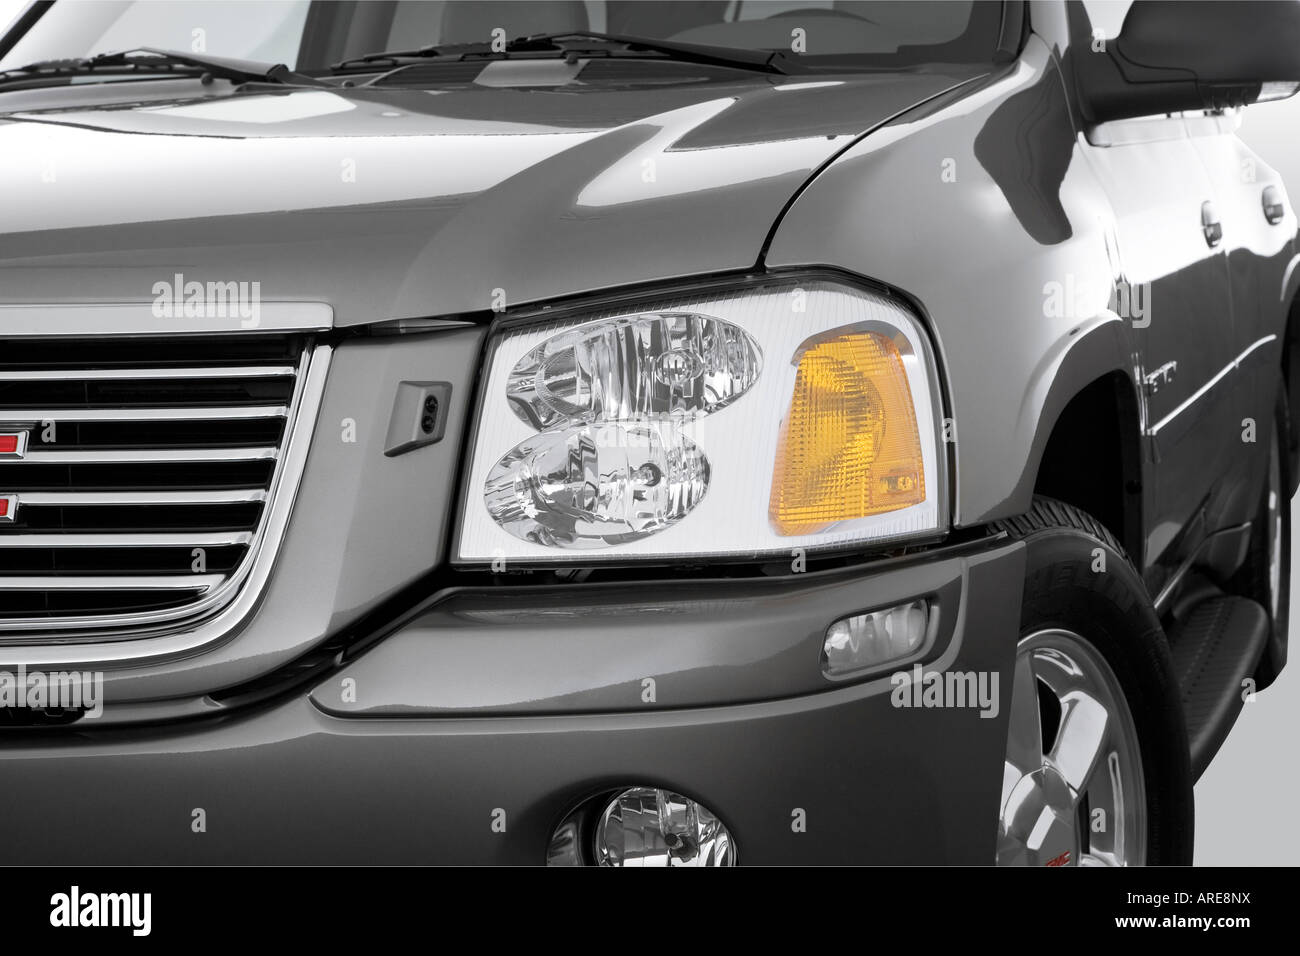 hight resolution of 2006 gmc envoy slt in gray headlight